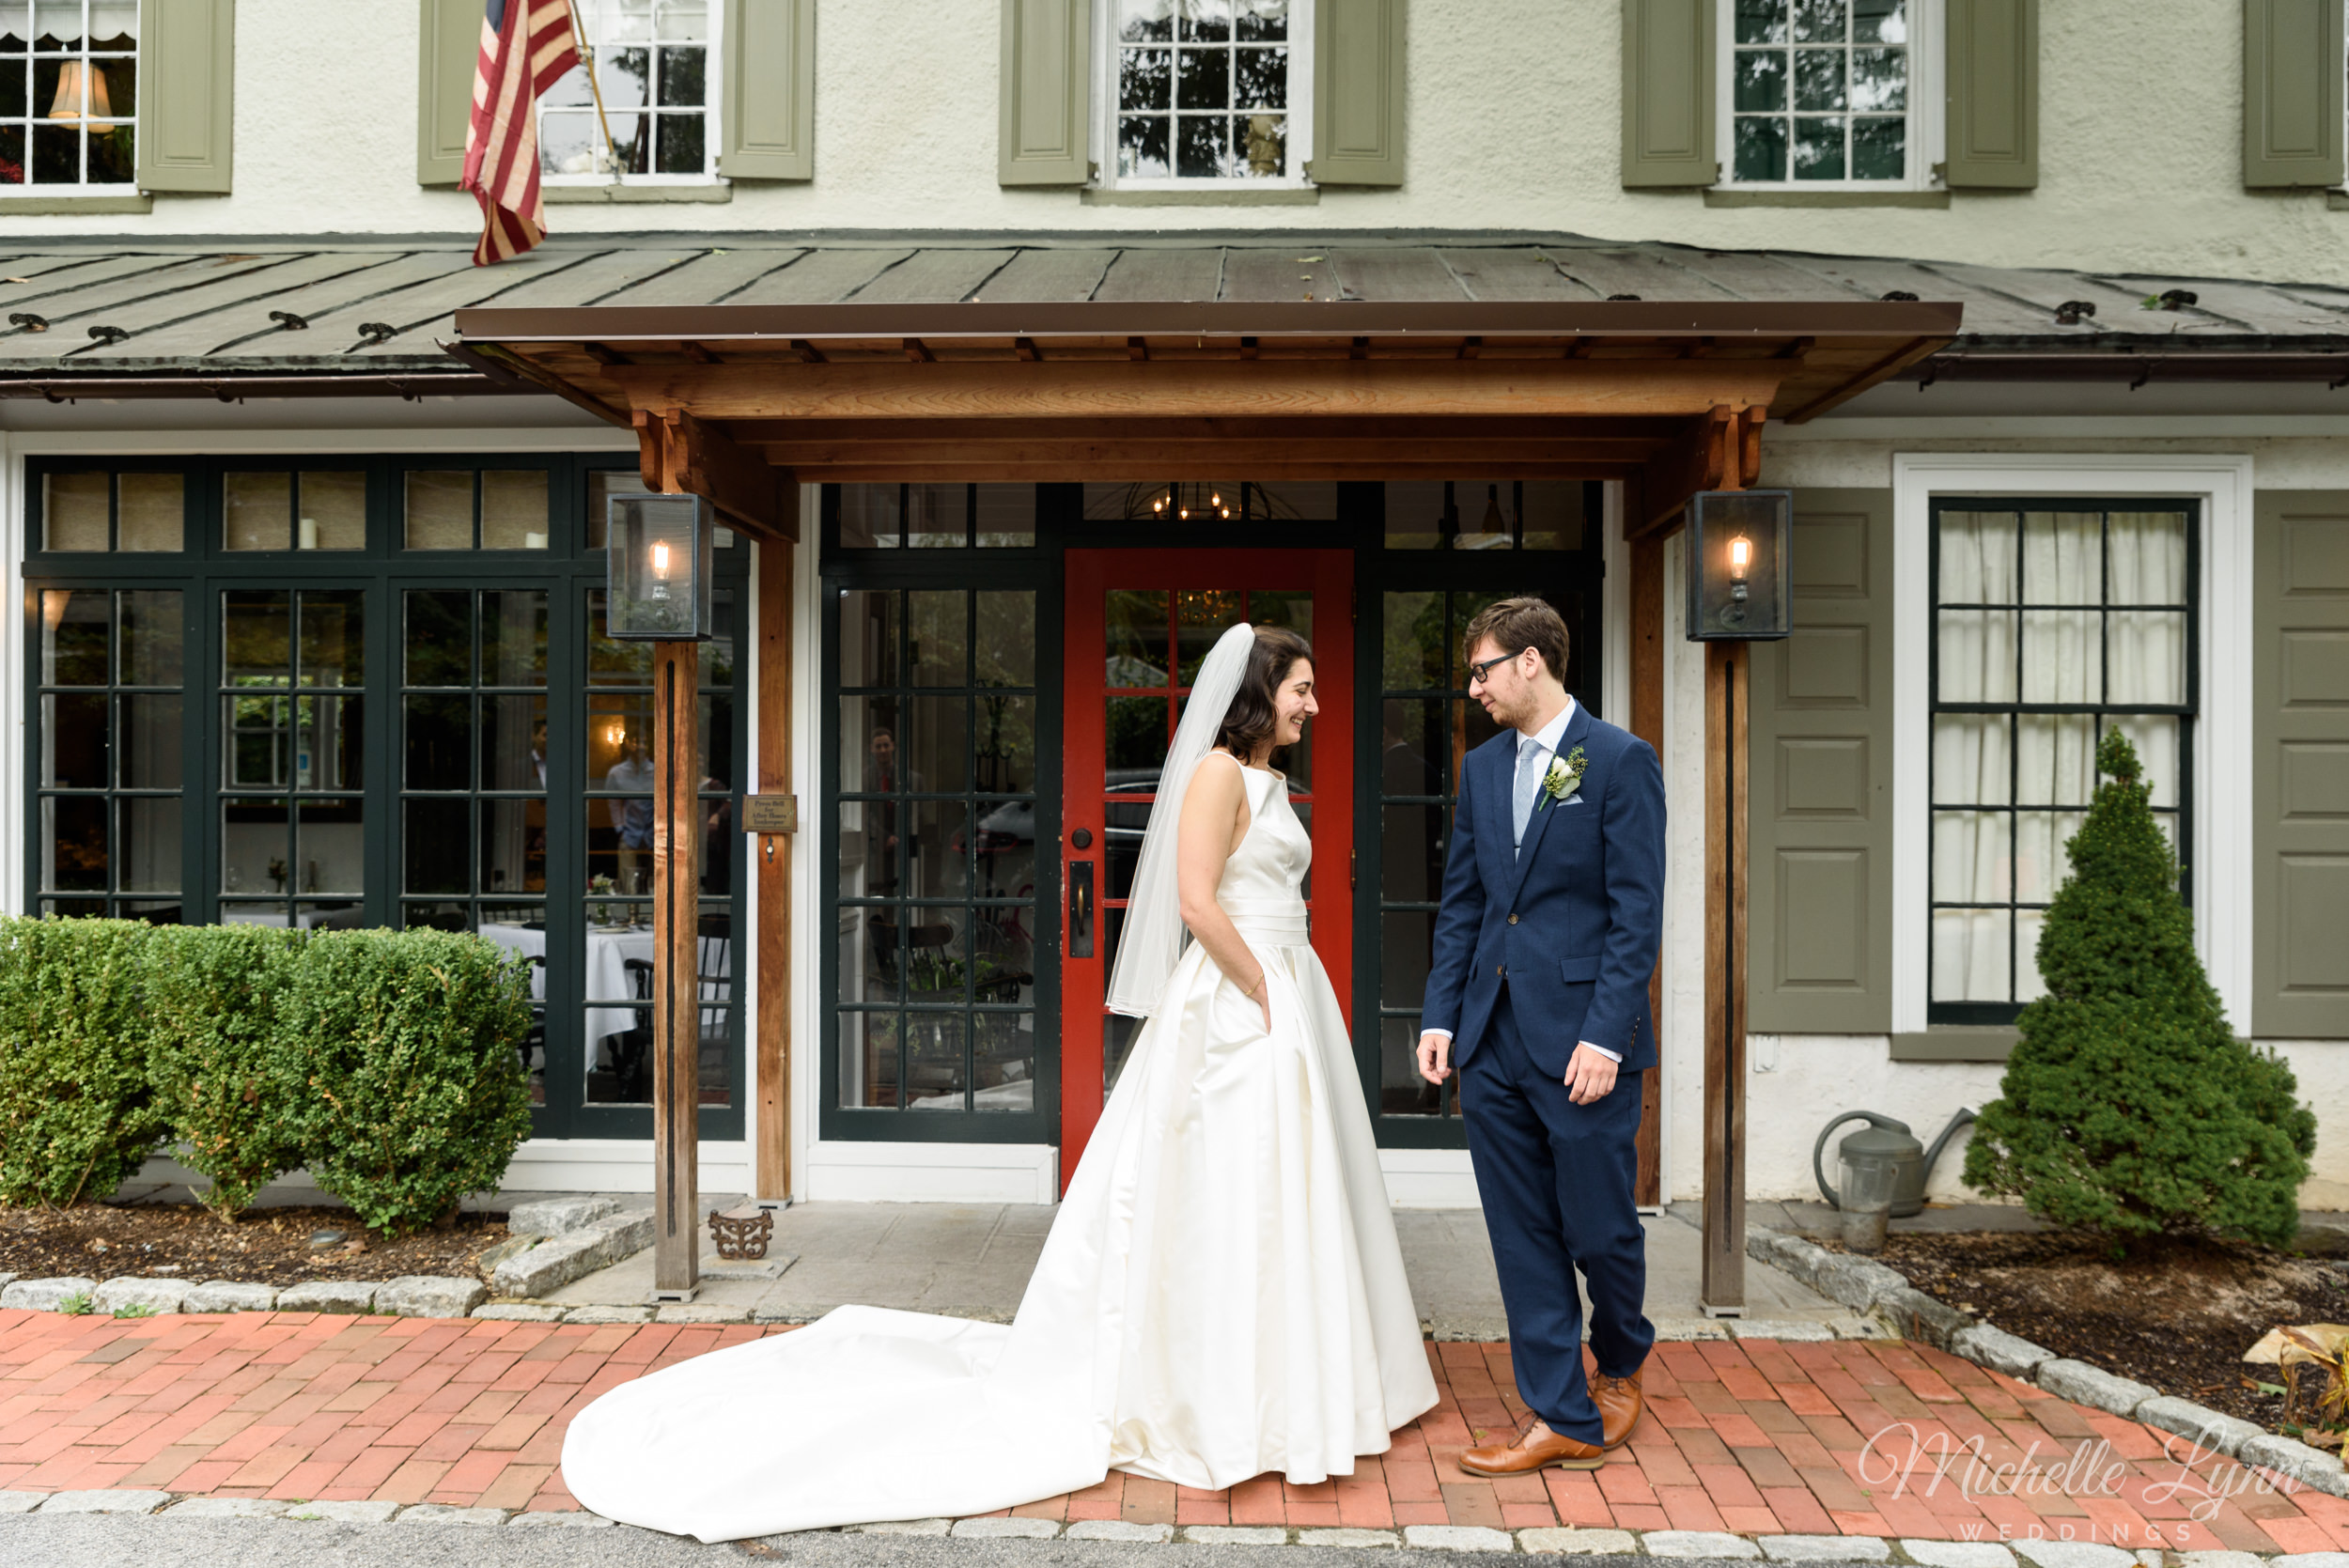 mlw-general-warren-malvern-wedding-photographer-12.jpg